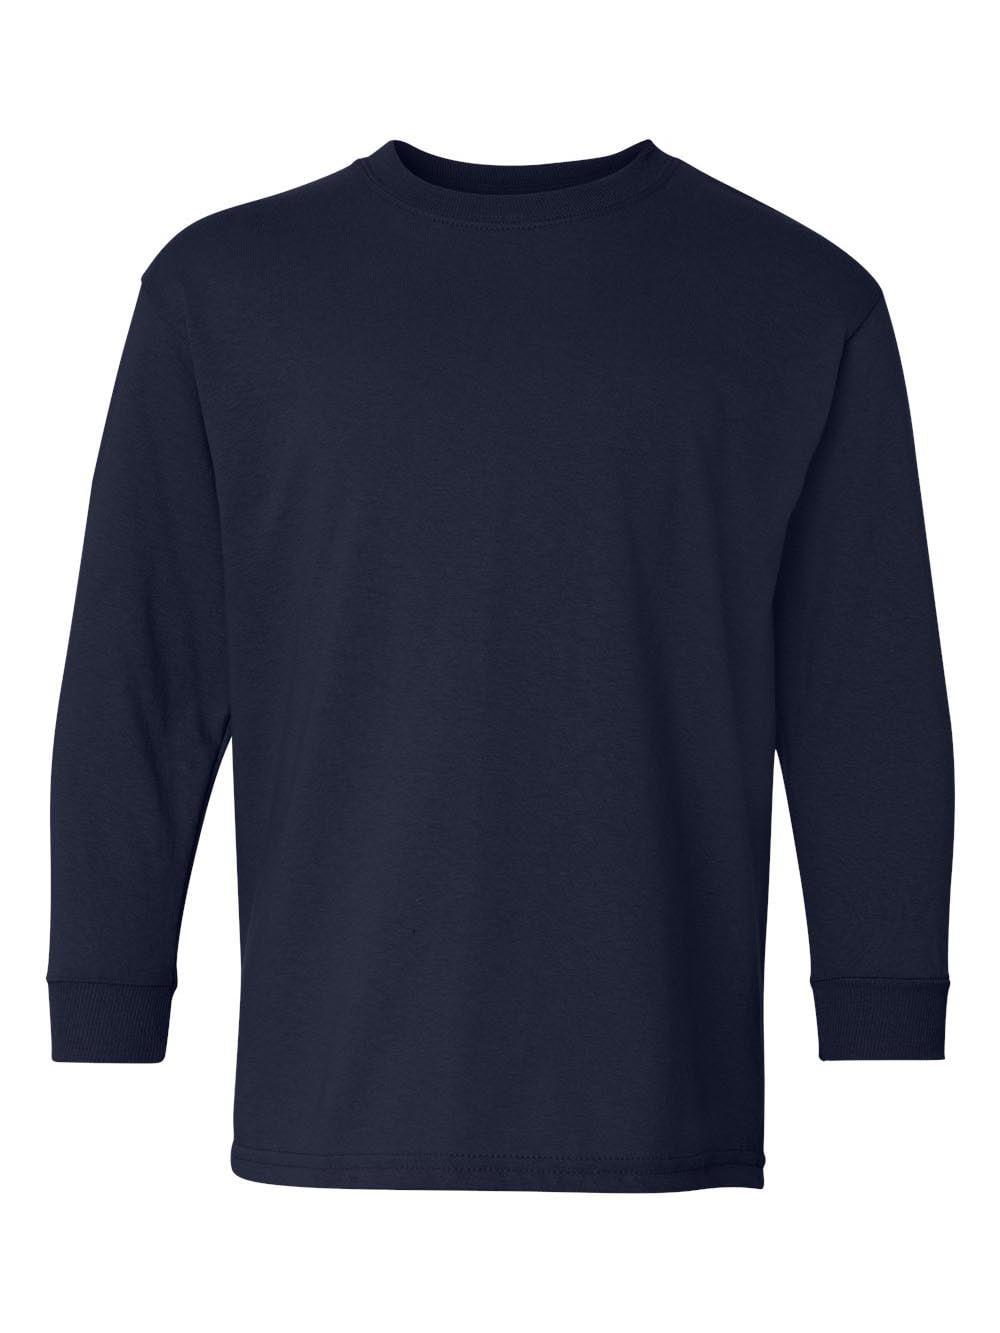 Gildan - Heavy Cotton Youth Long Sleeve T-Shirt - 5400B